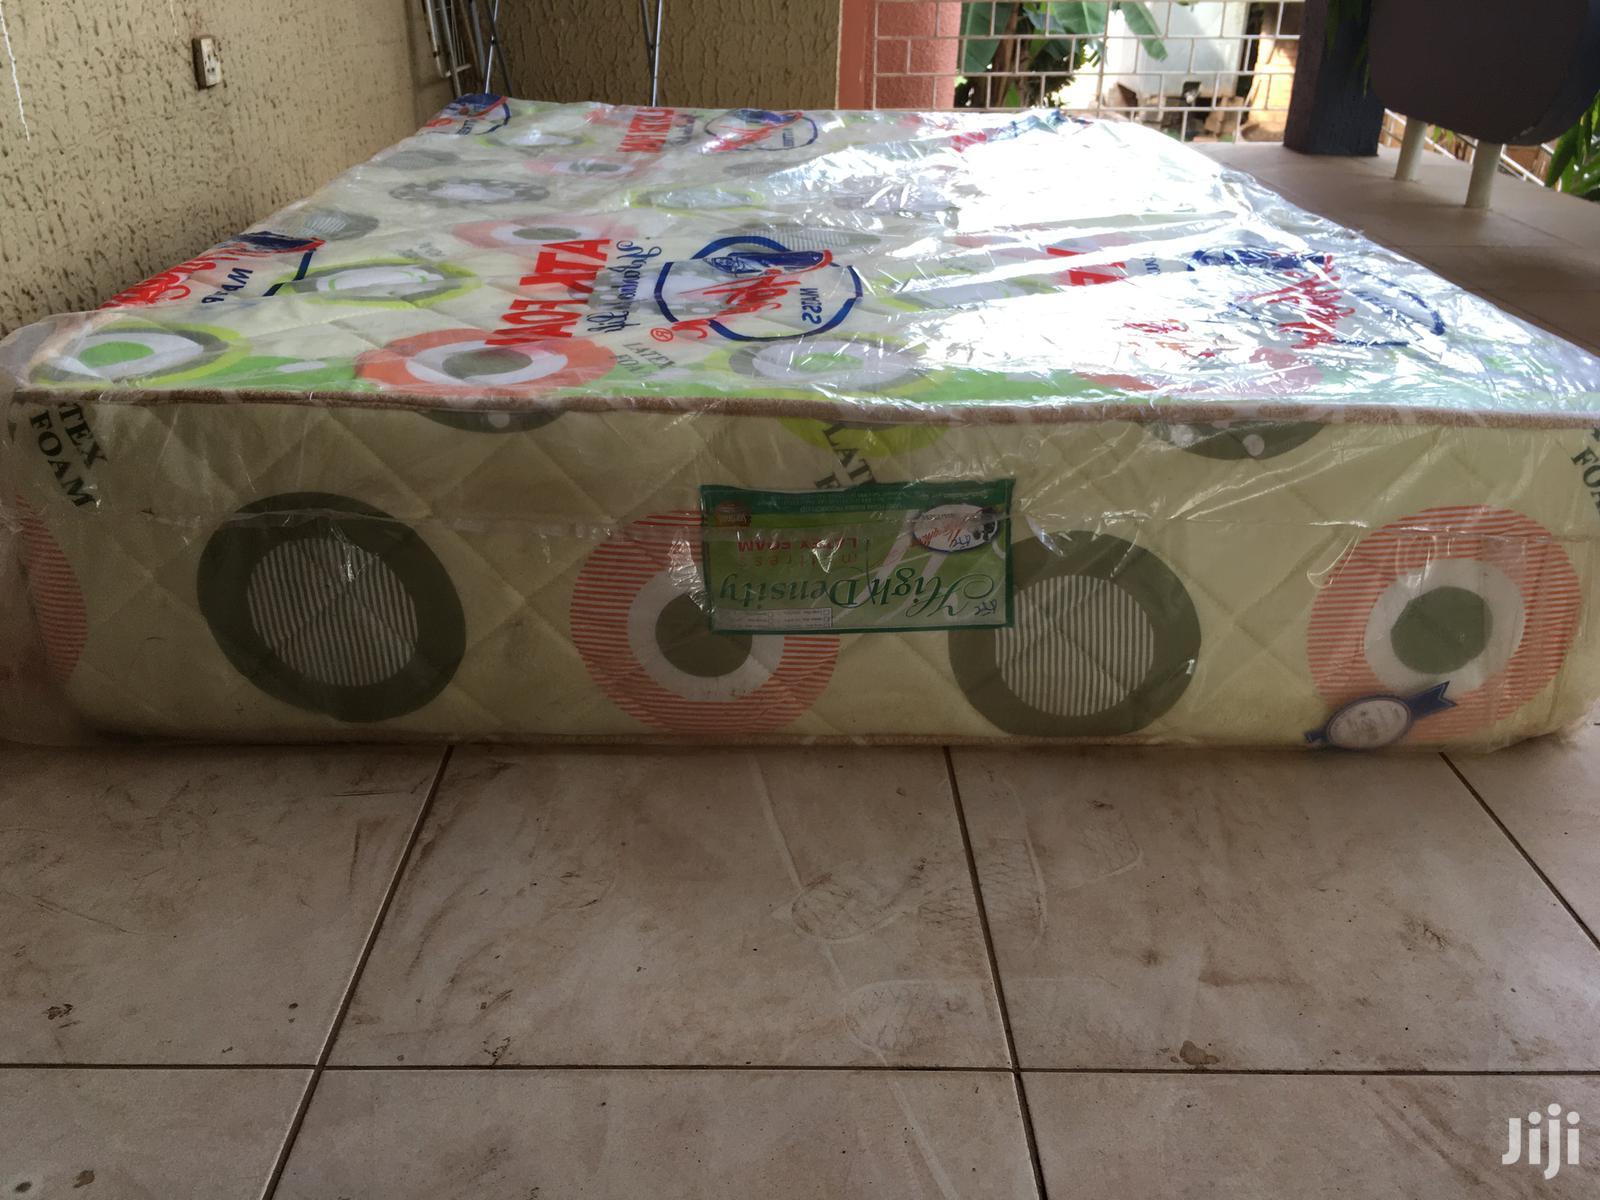 12 Inches High Density Latex Foam Mattress | Furniture for sale in Kumasi Metropolitan, Ashanti, Ghana